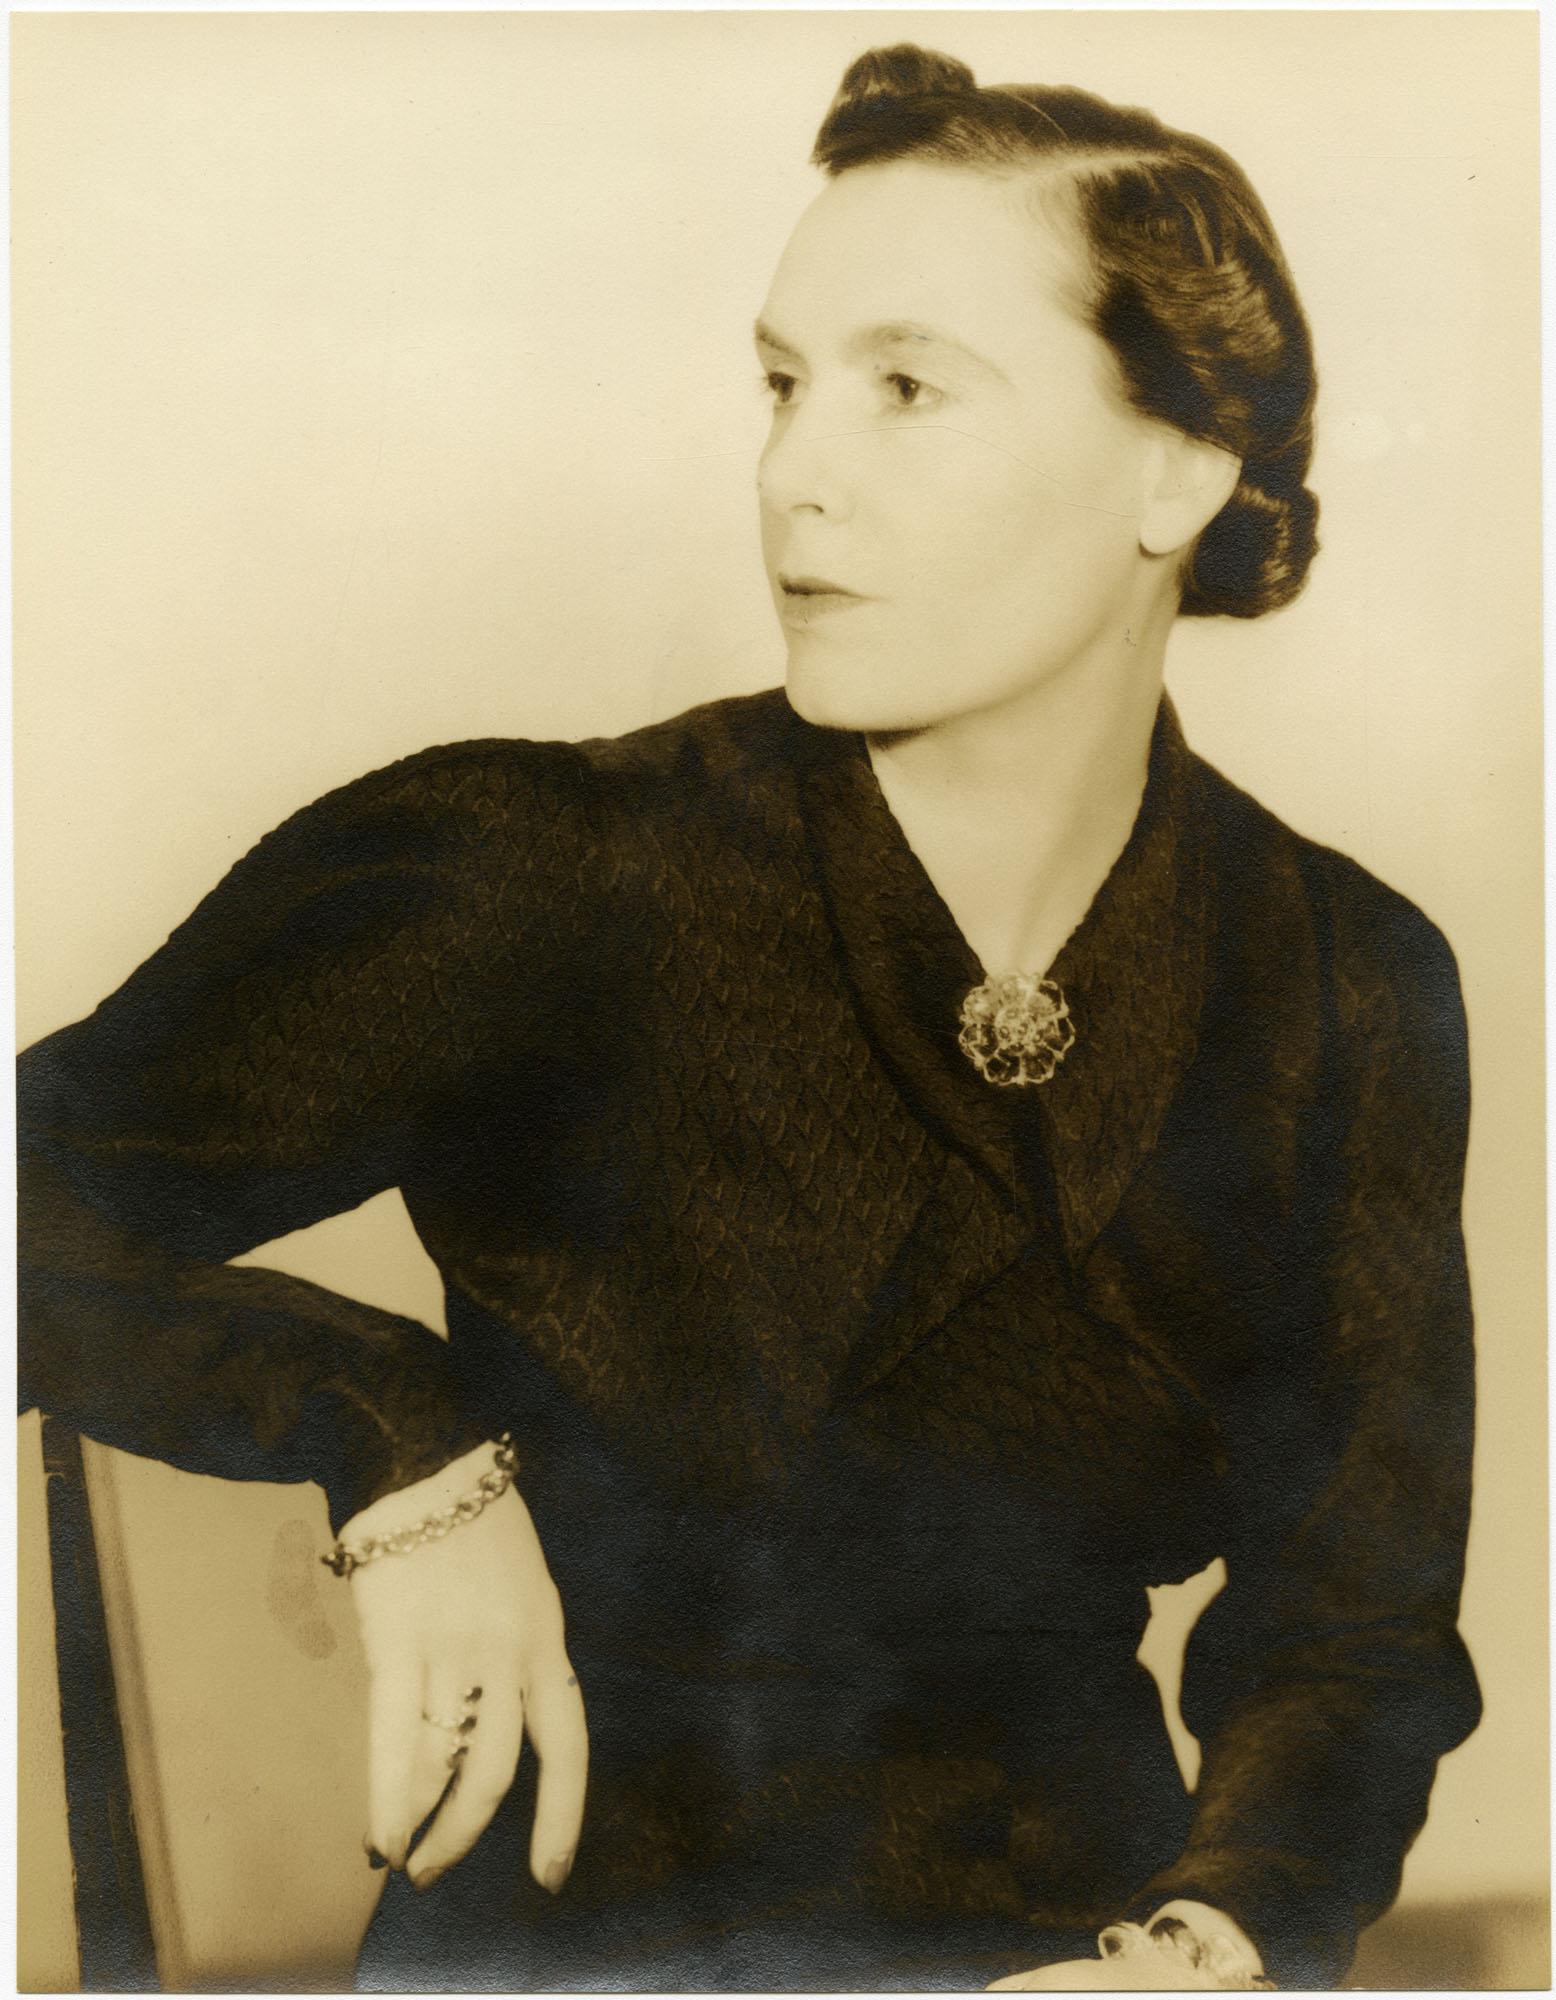 Jane Sanford Pansa, Portrait 7